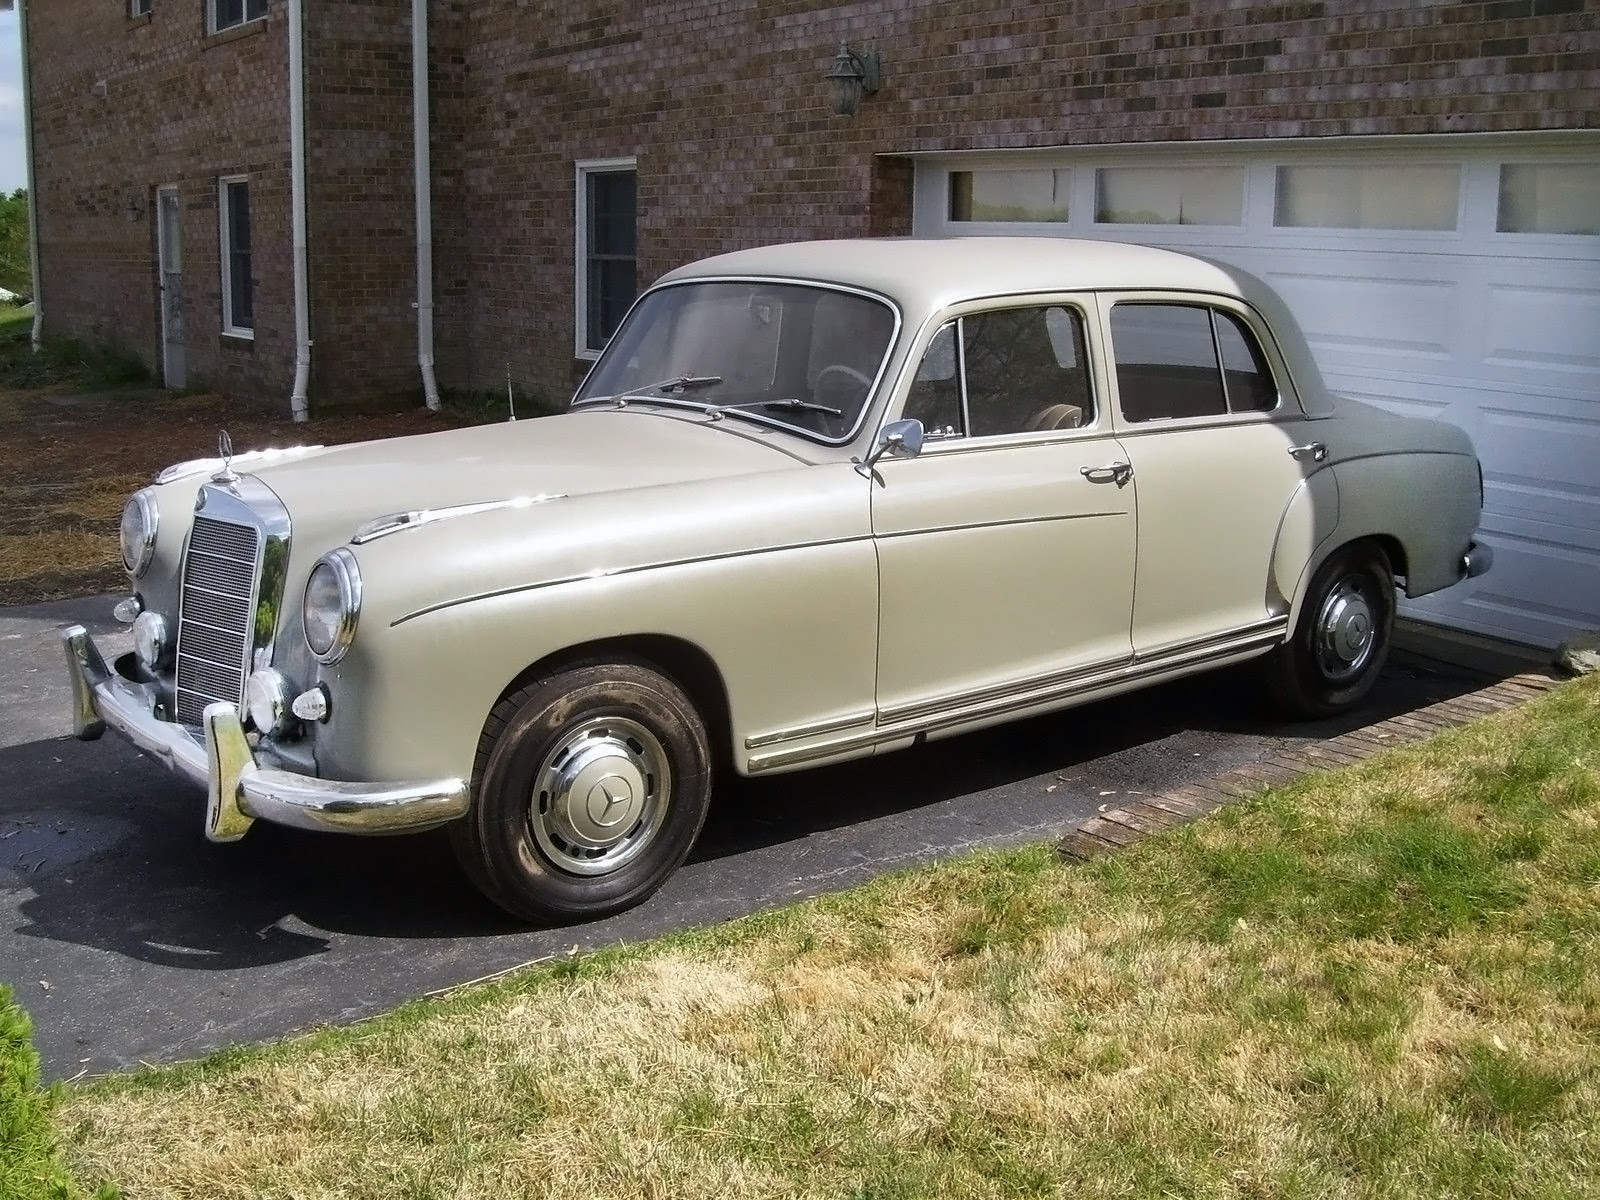 Preserved Ponton: 1959 Mercedes-Benz 220S